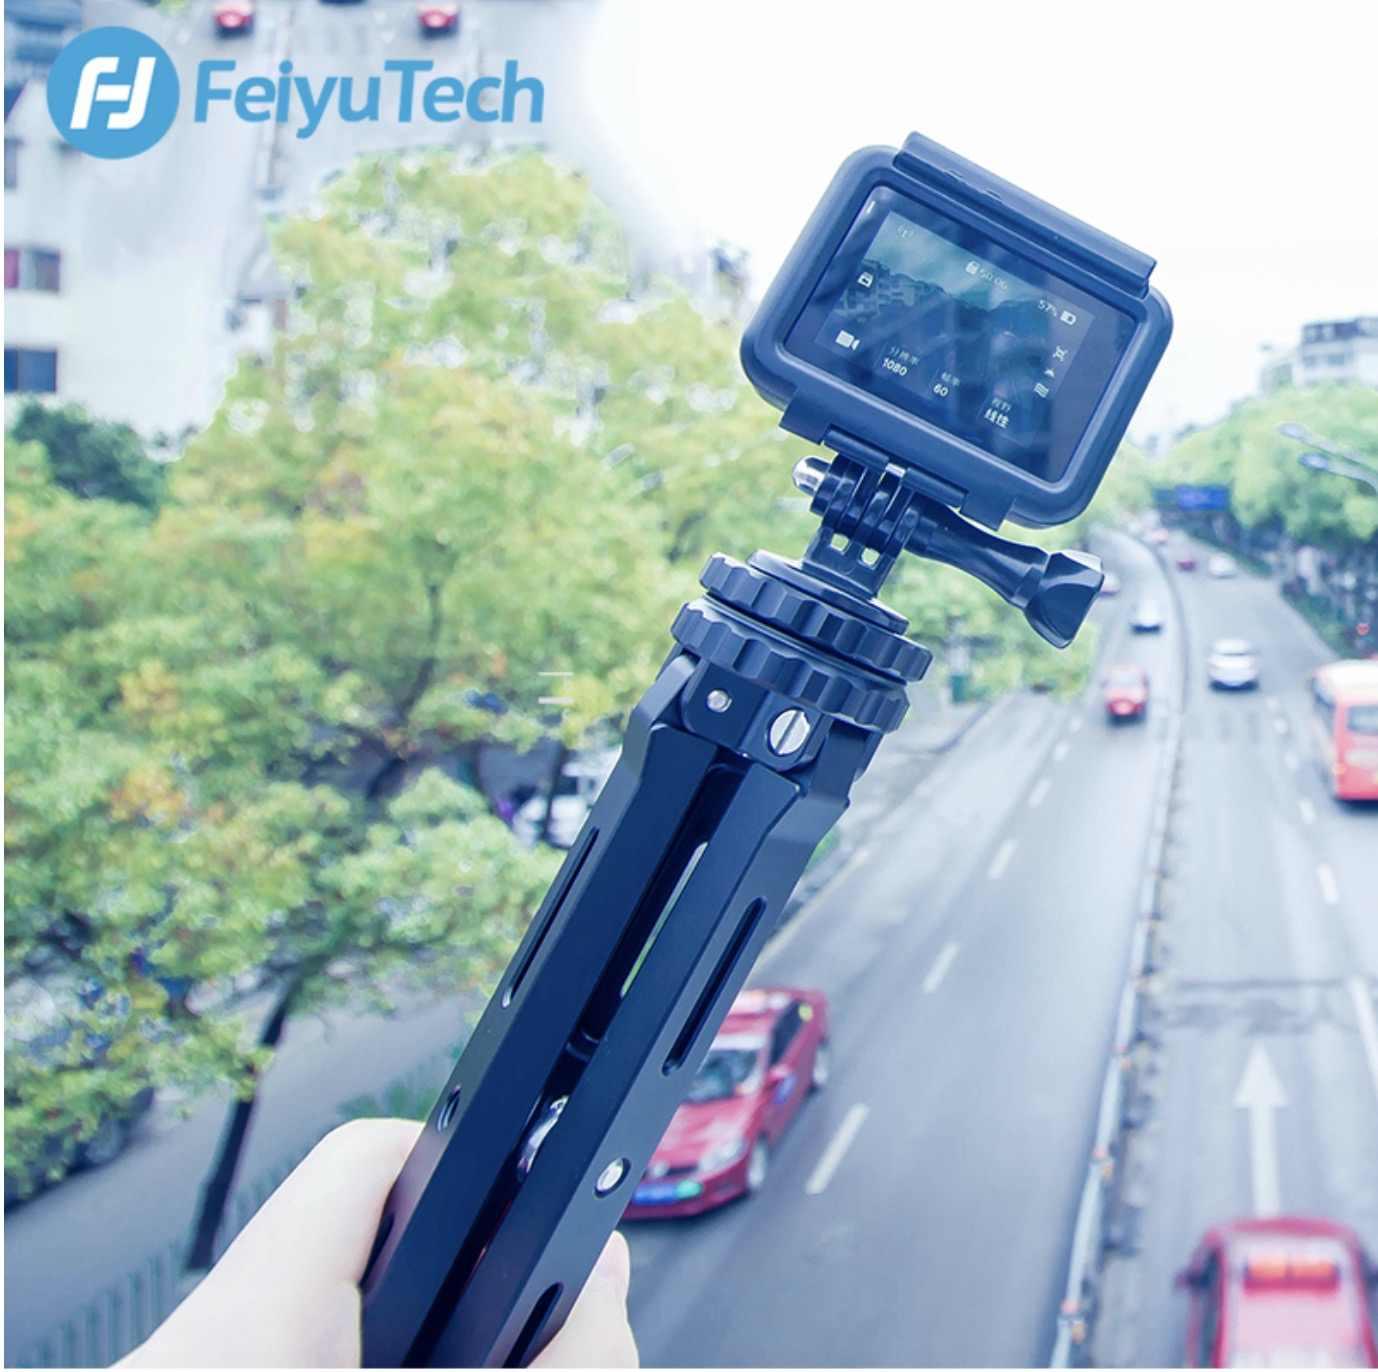 FeiyuTech 最新金属三脚のため Feiyu AK2000 SPG2 A1000/A2000 シリーズ G6Plus ジン